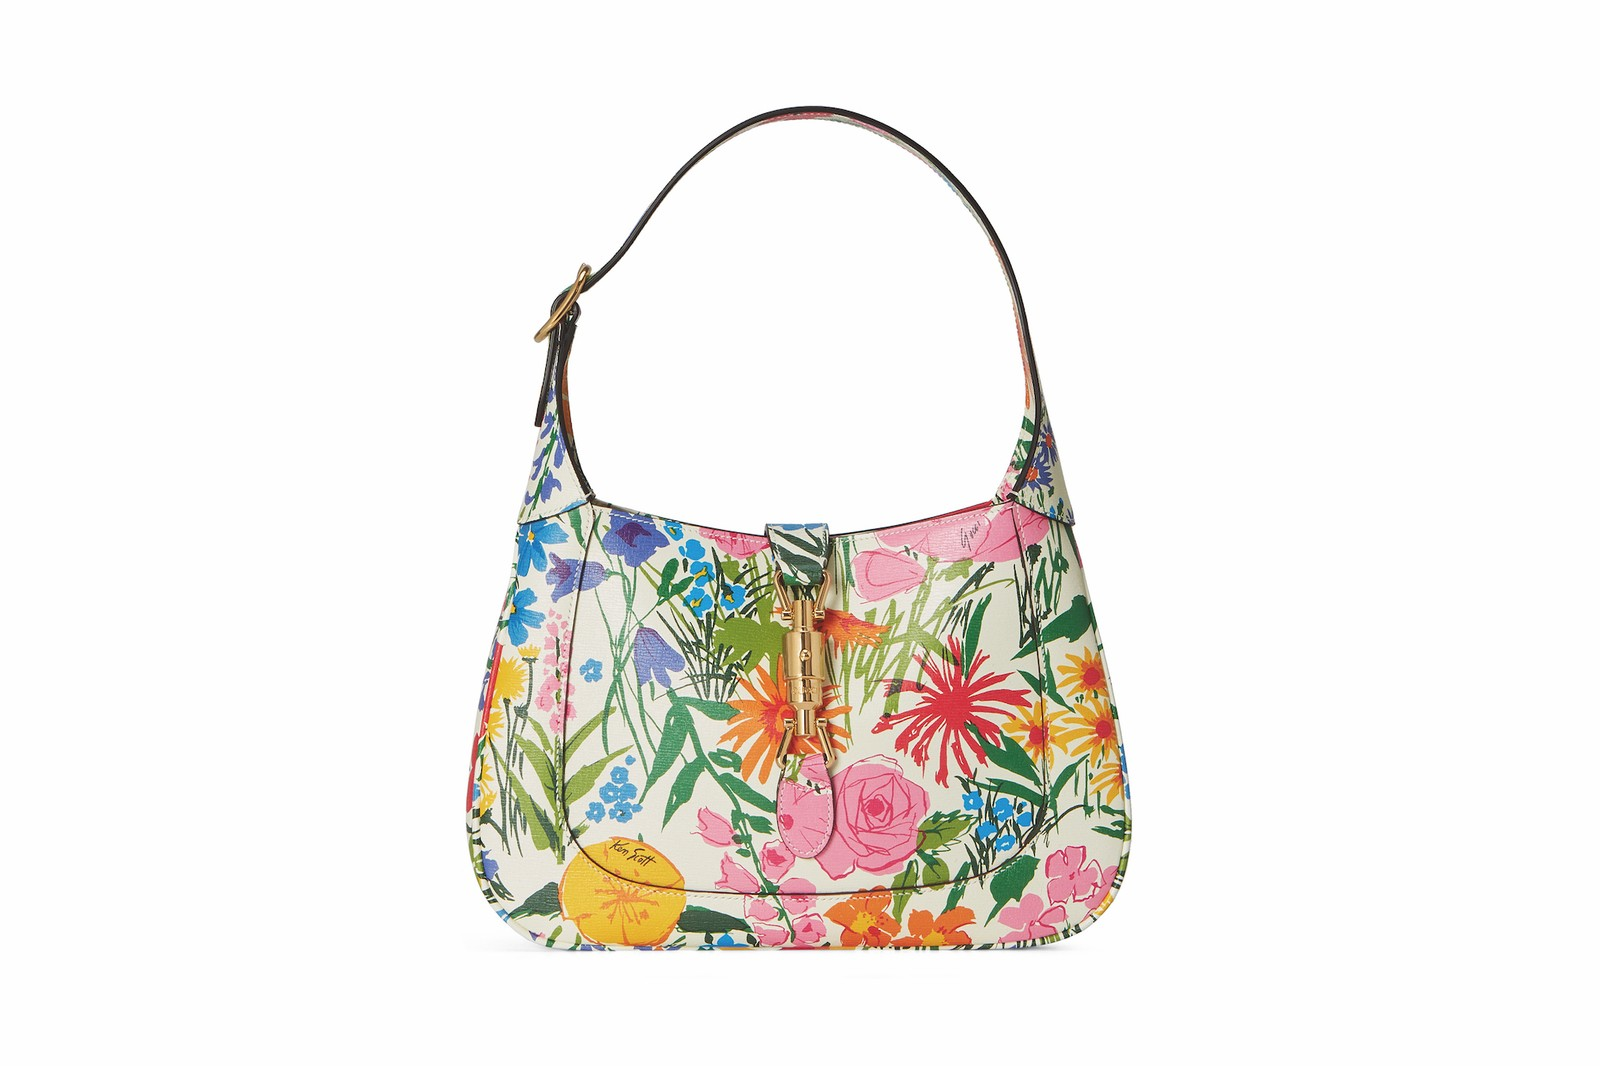 Best Spring/Summer 2021 Luxury Designer Bags Louis Vuitton Fendi Loewe Alexander McQueen Gucci